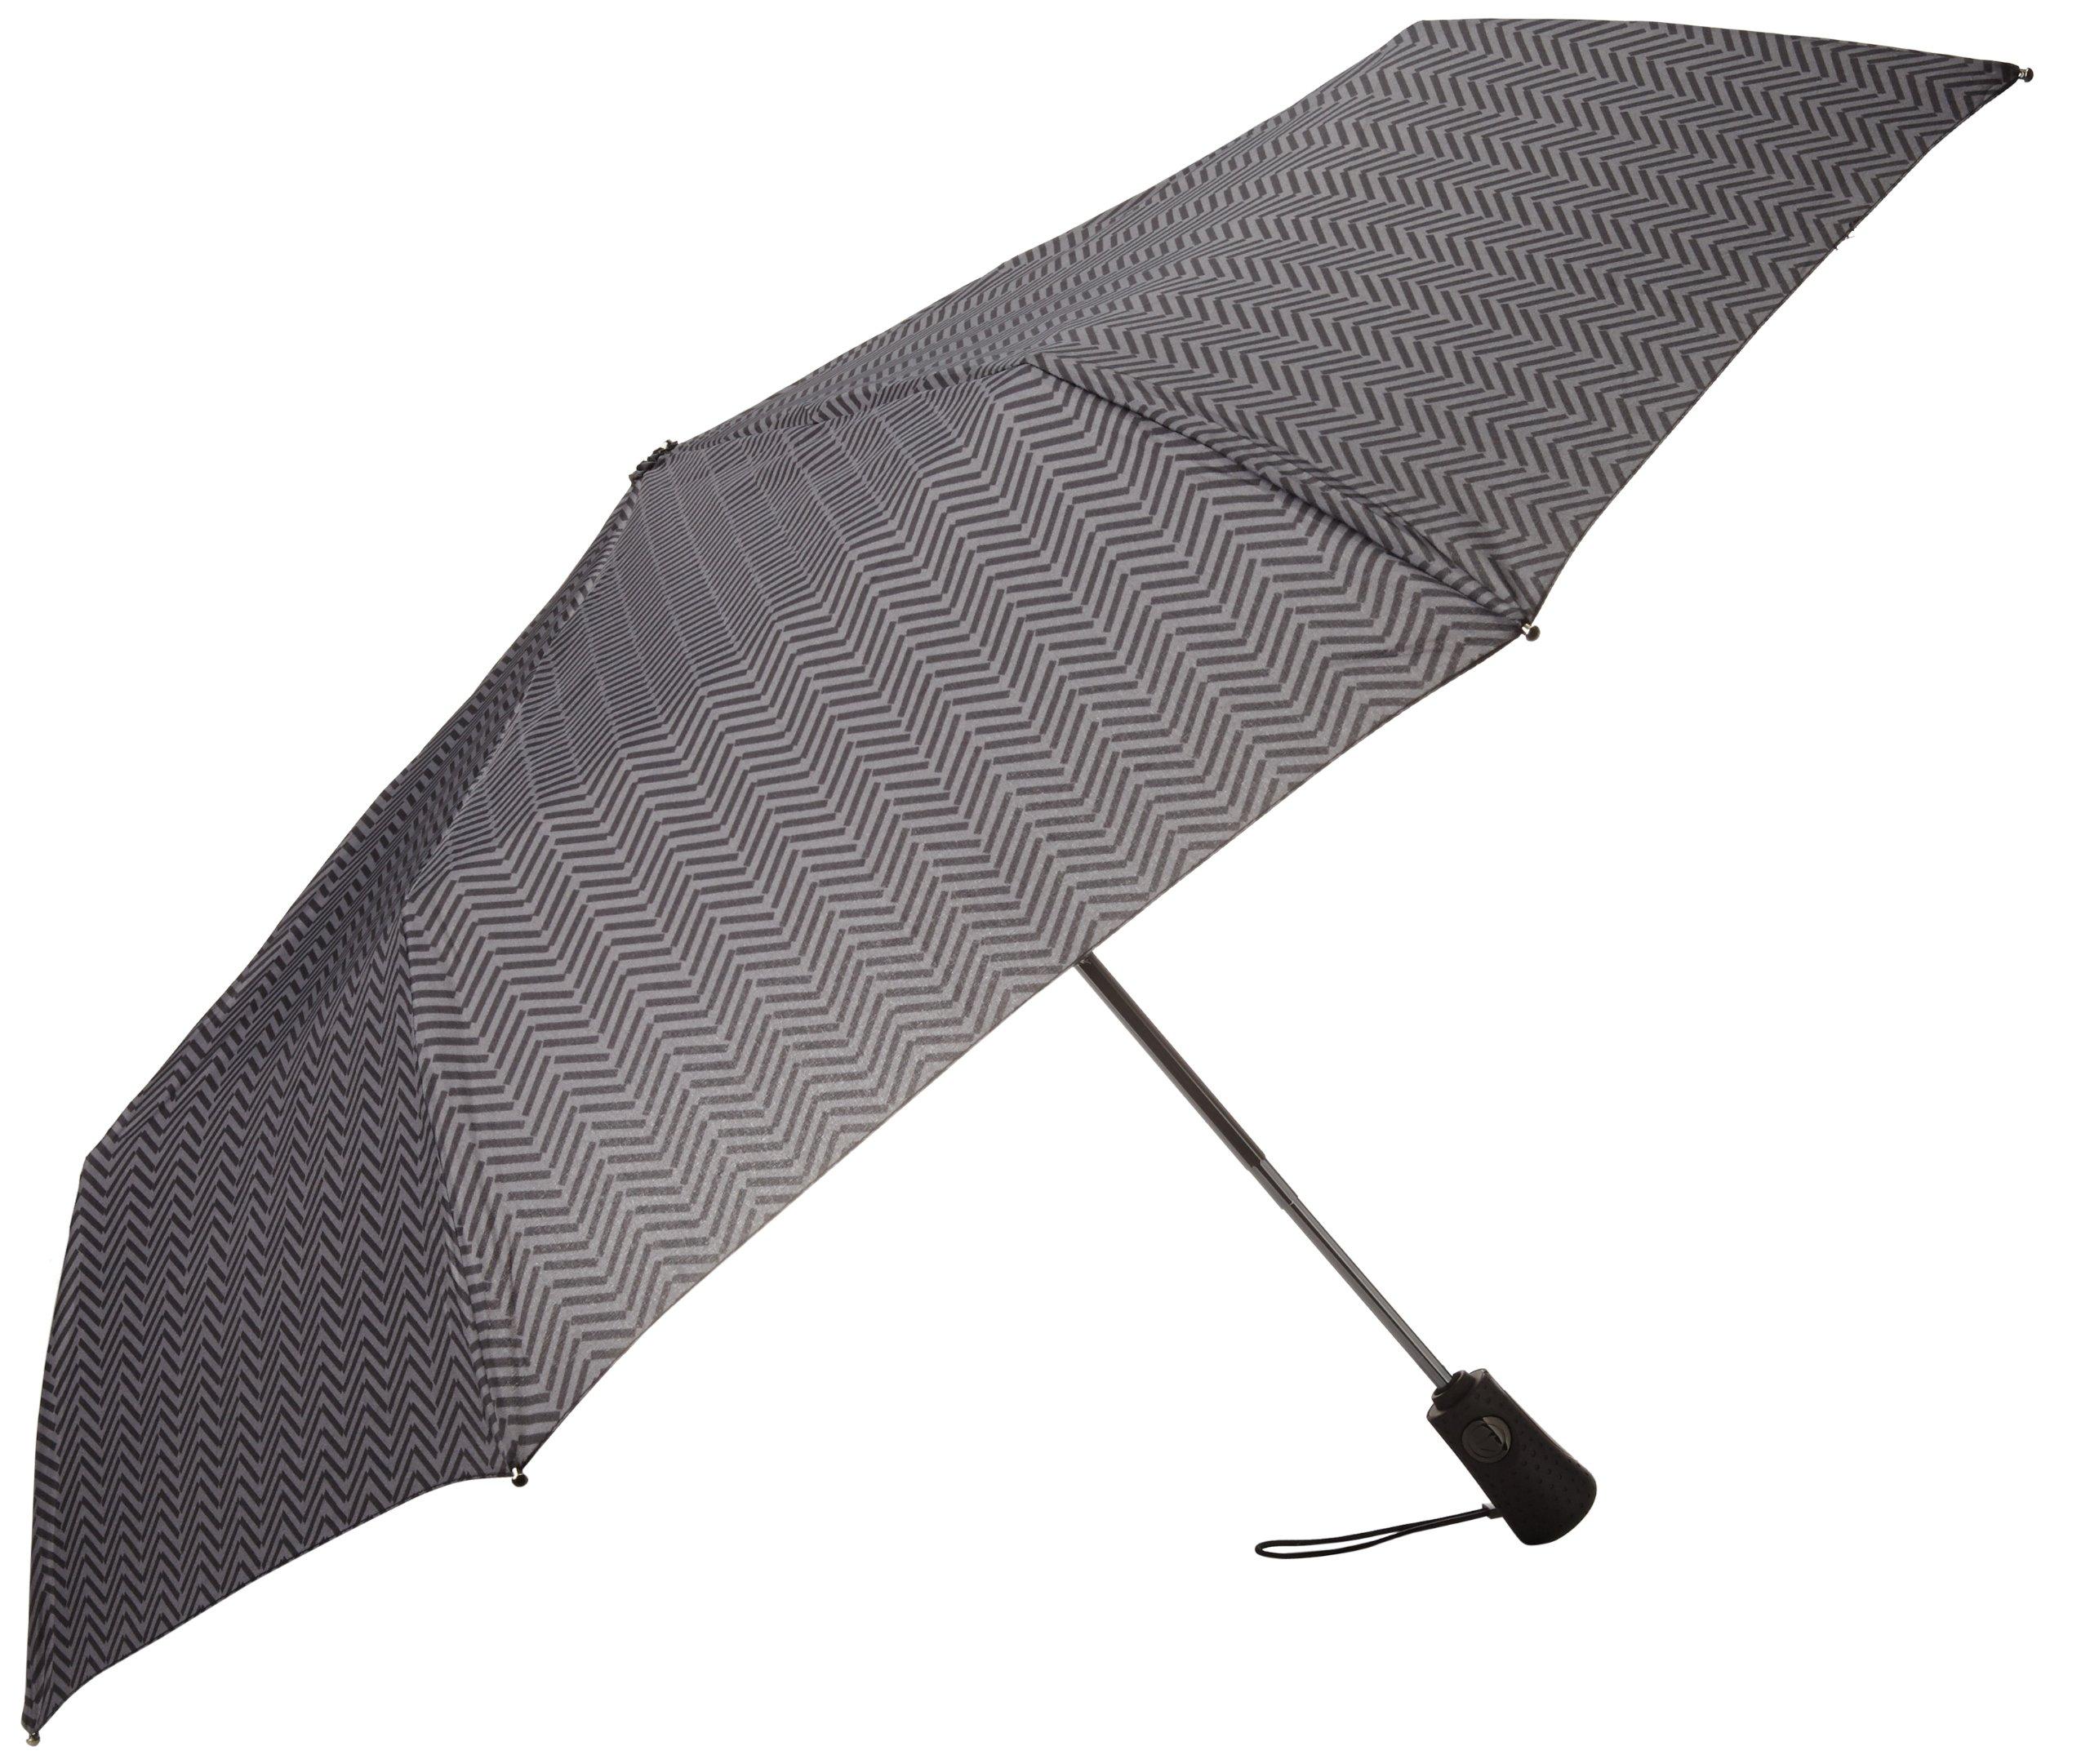 Totes Titan Compact Travel Umbrella, Windproof, Waterproof, Auto Open/Close